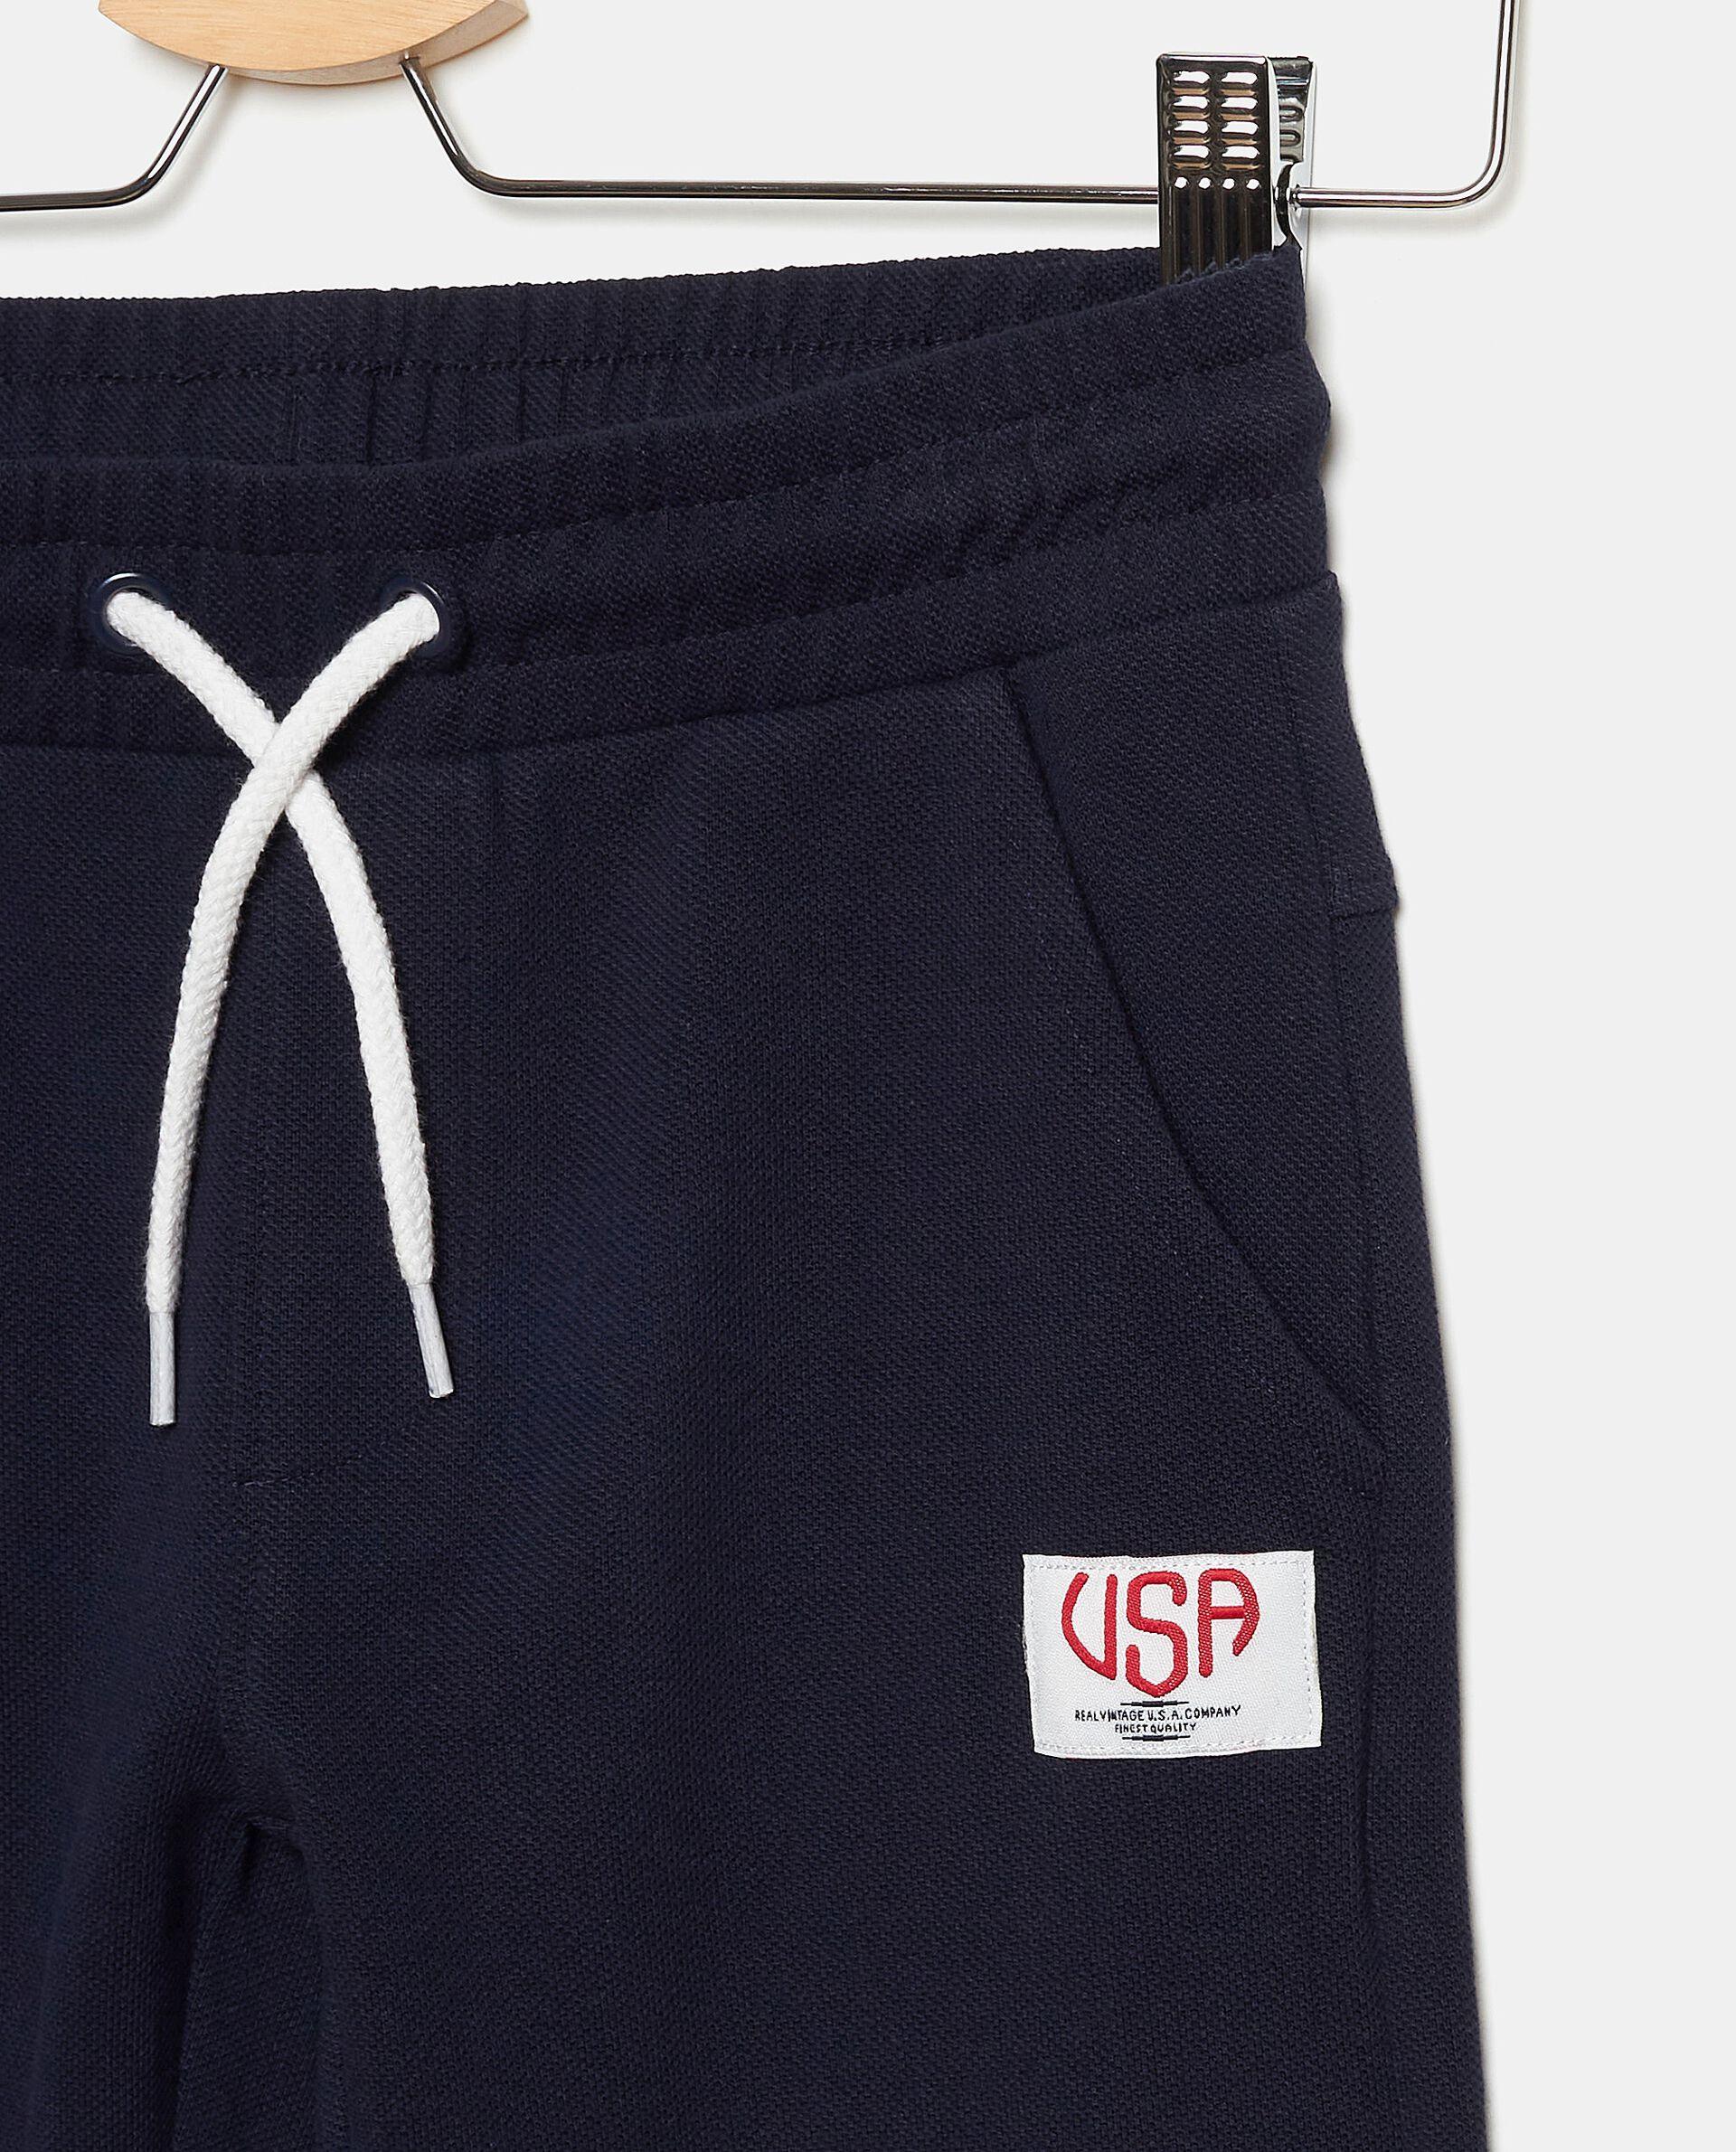 Pantaloni tinta unita in puro cotone bambino